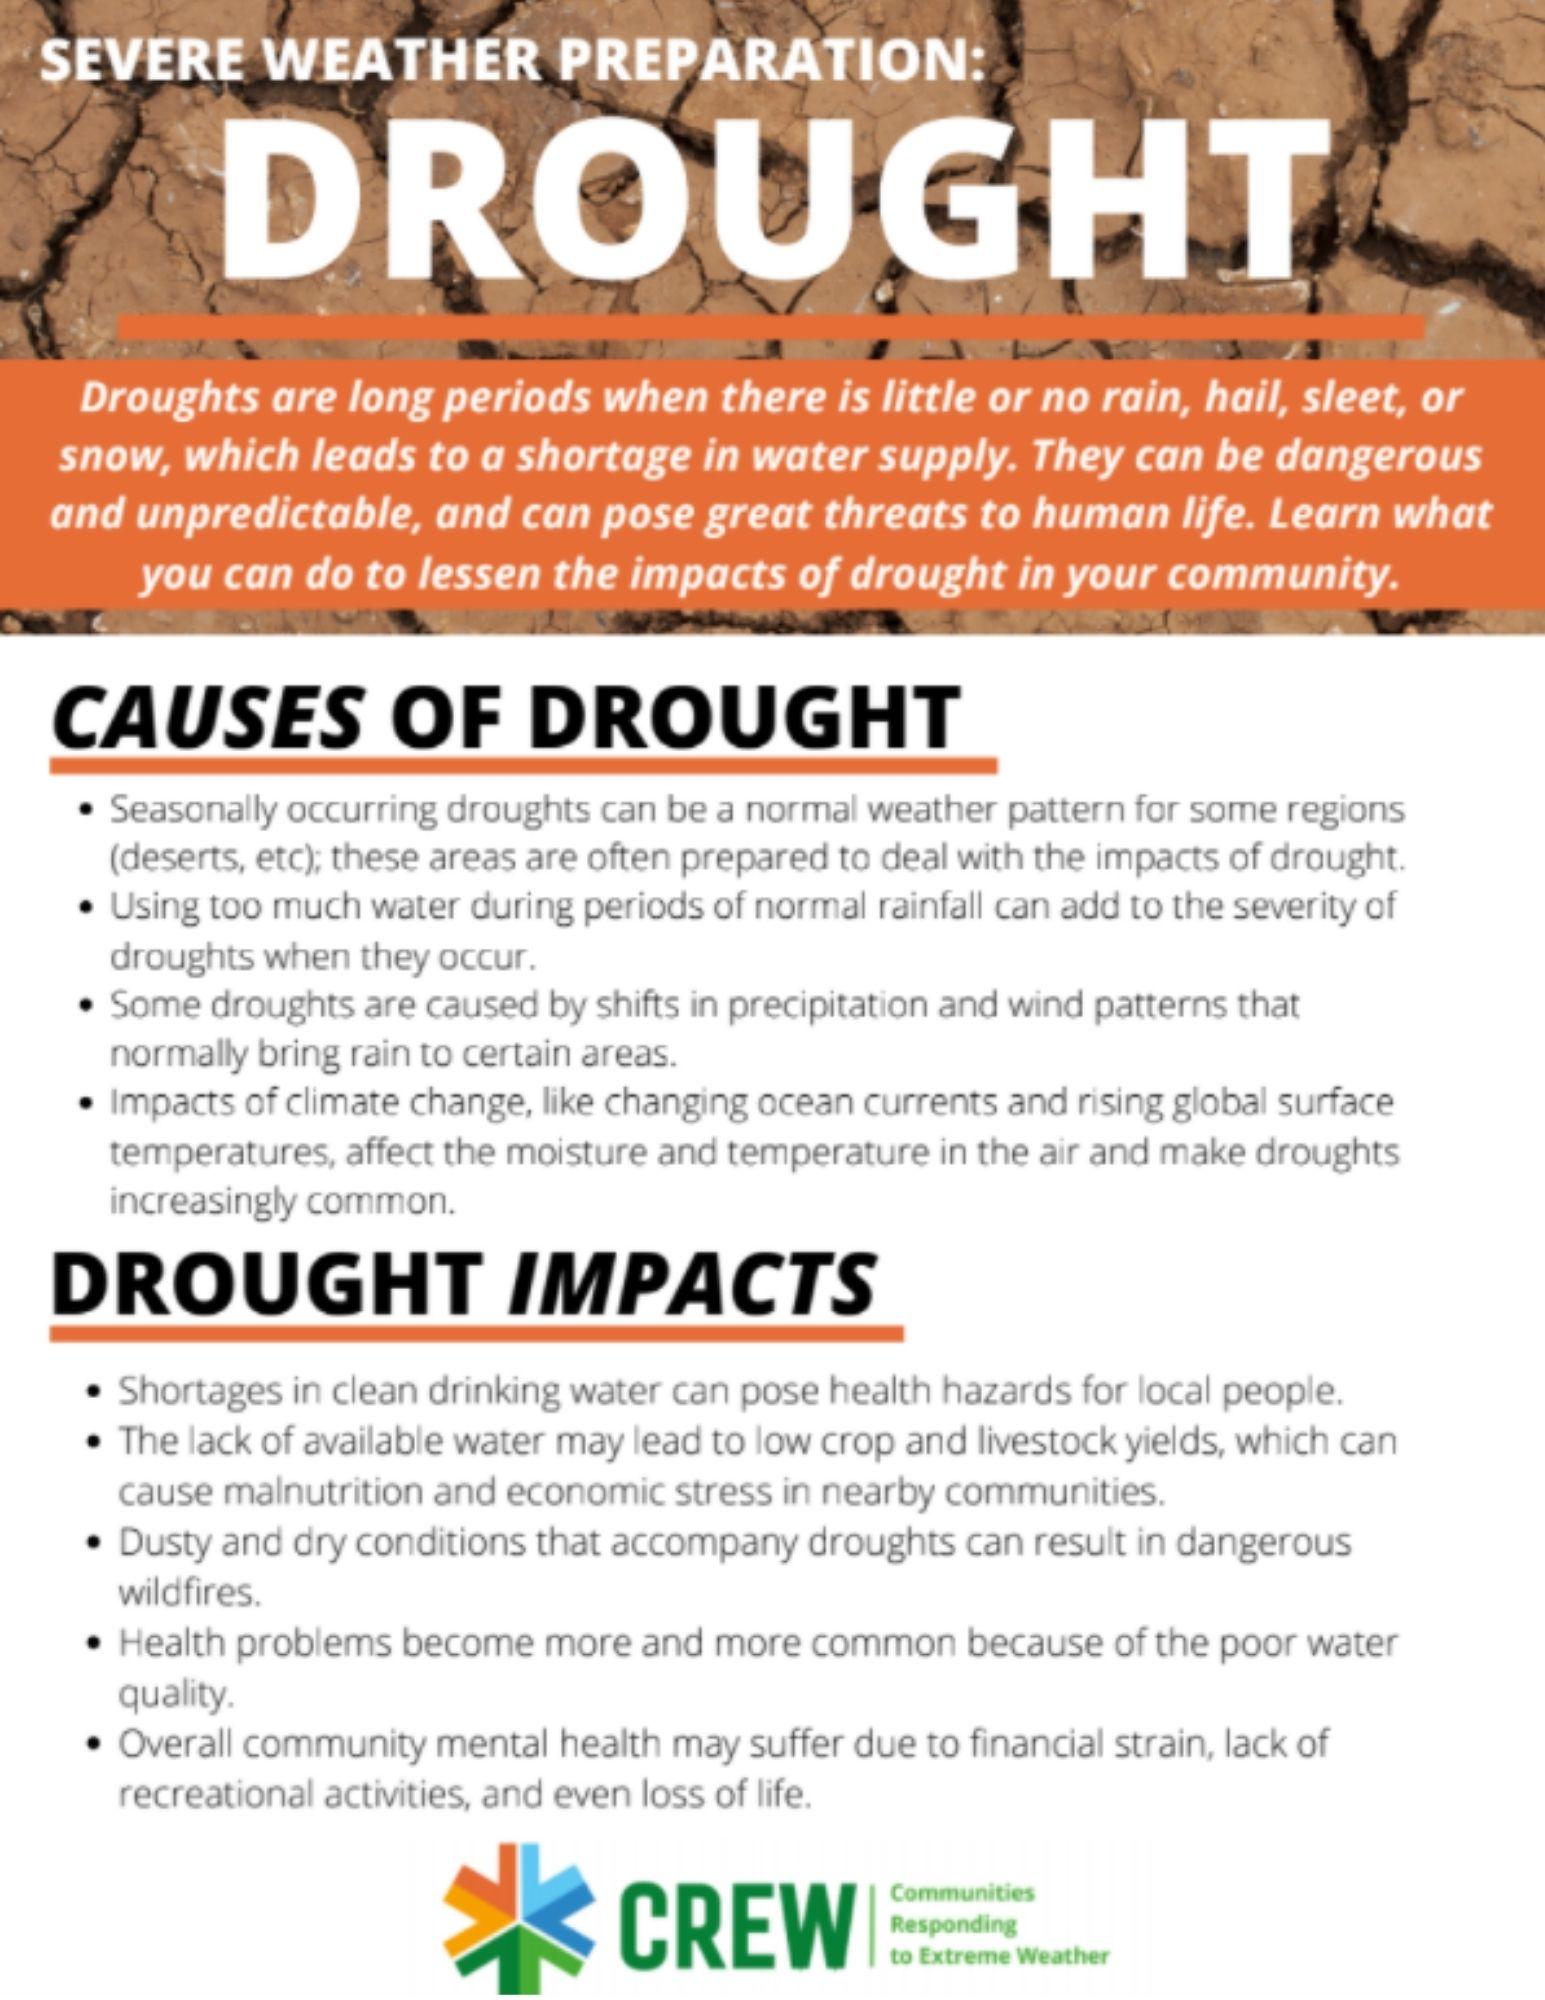 Drought preparation brochure